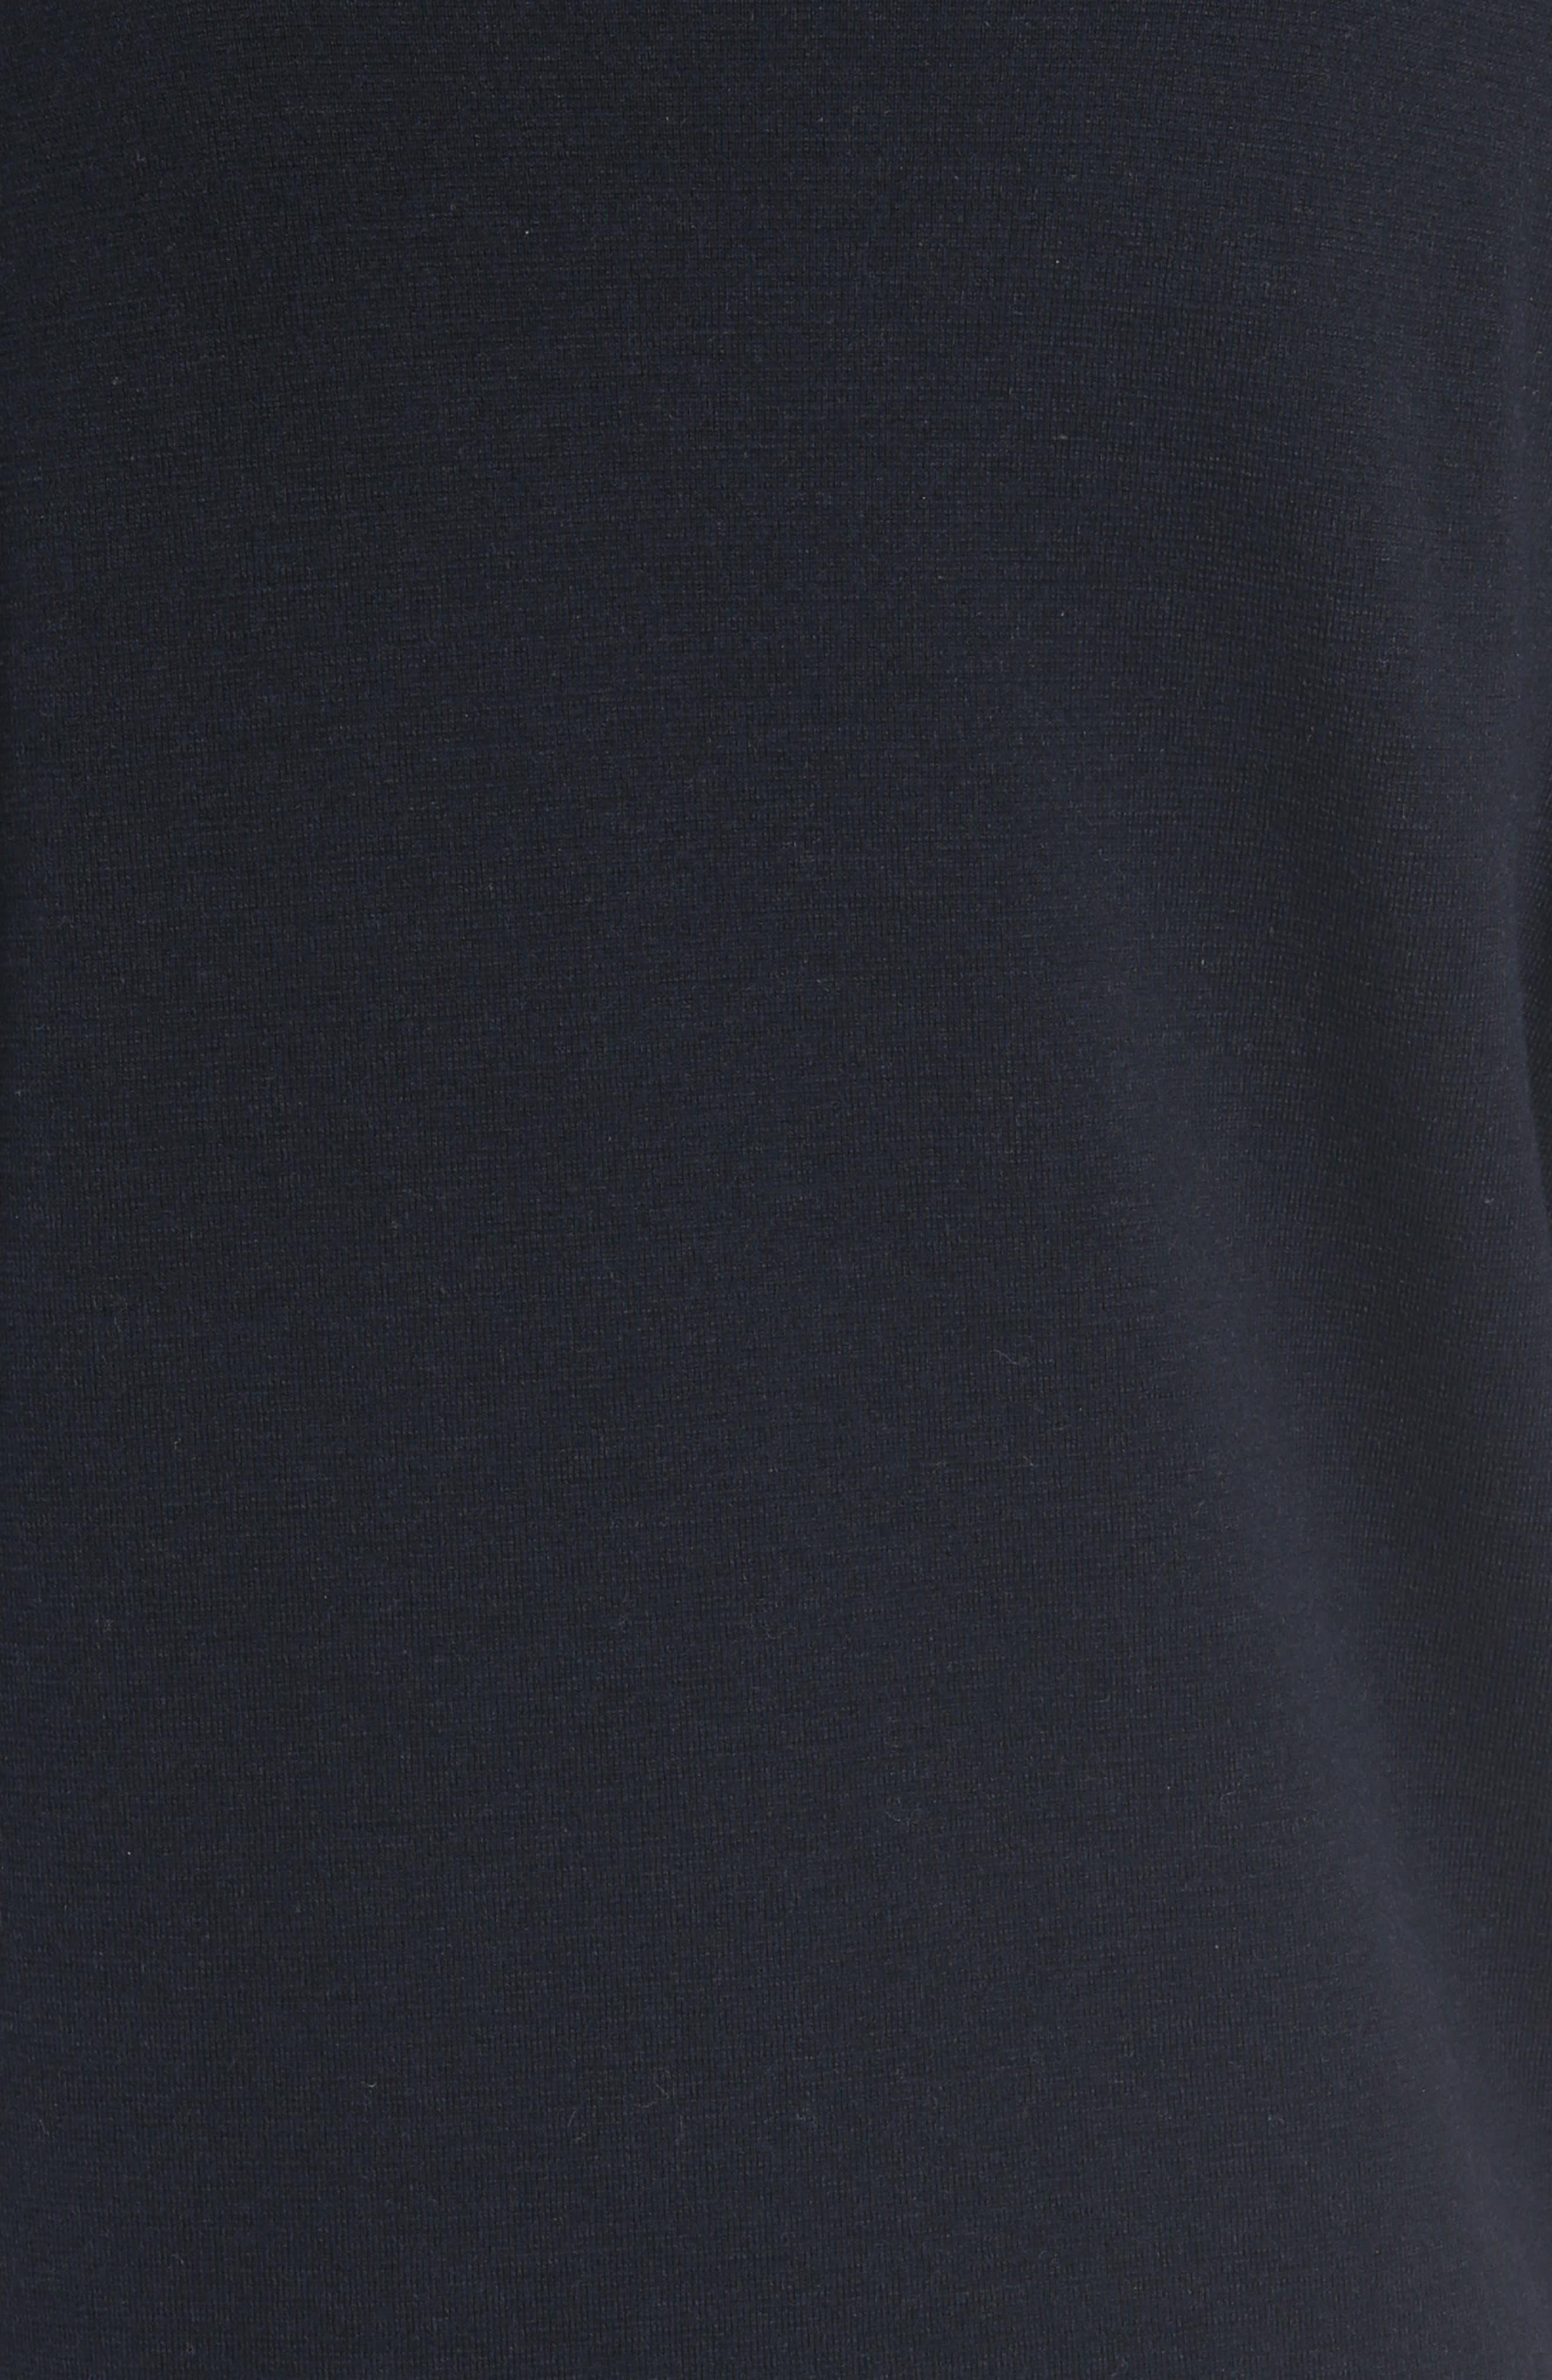 Laced Grommet Wool Dress,                             Alternate thumbnail 5, color,                             410